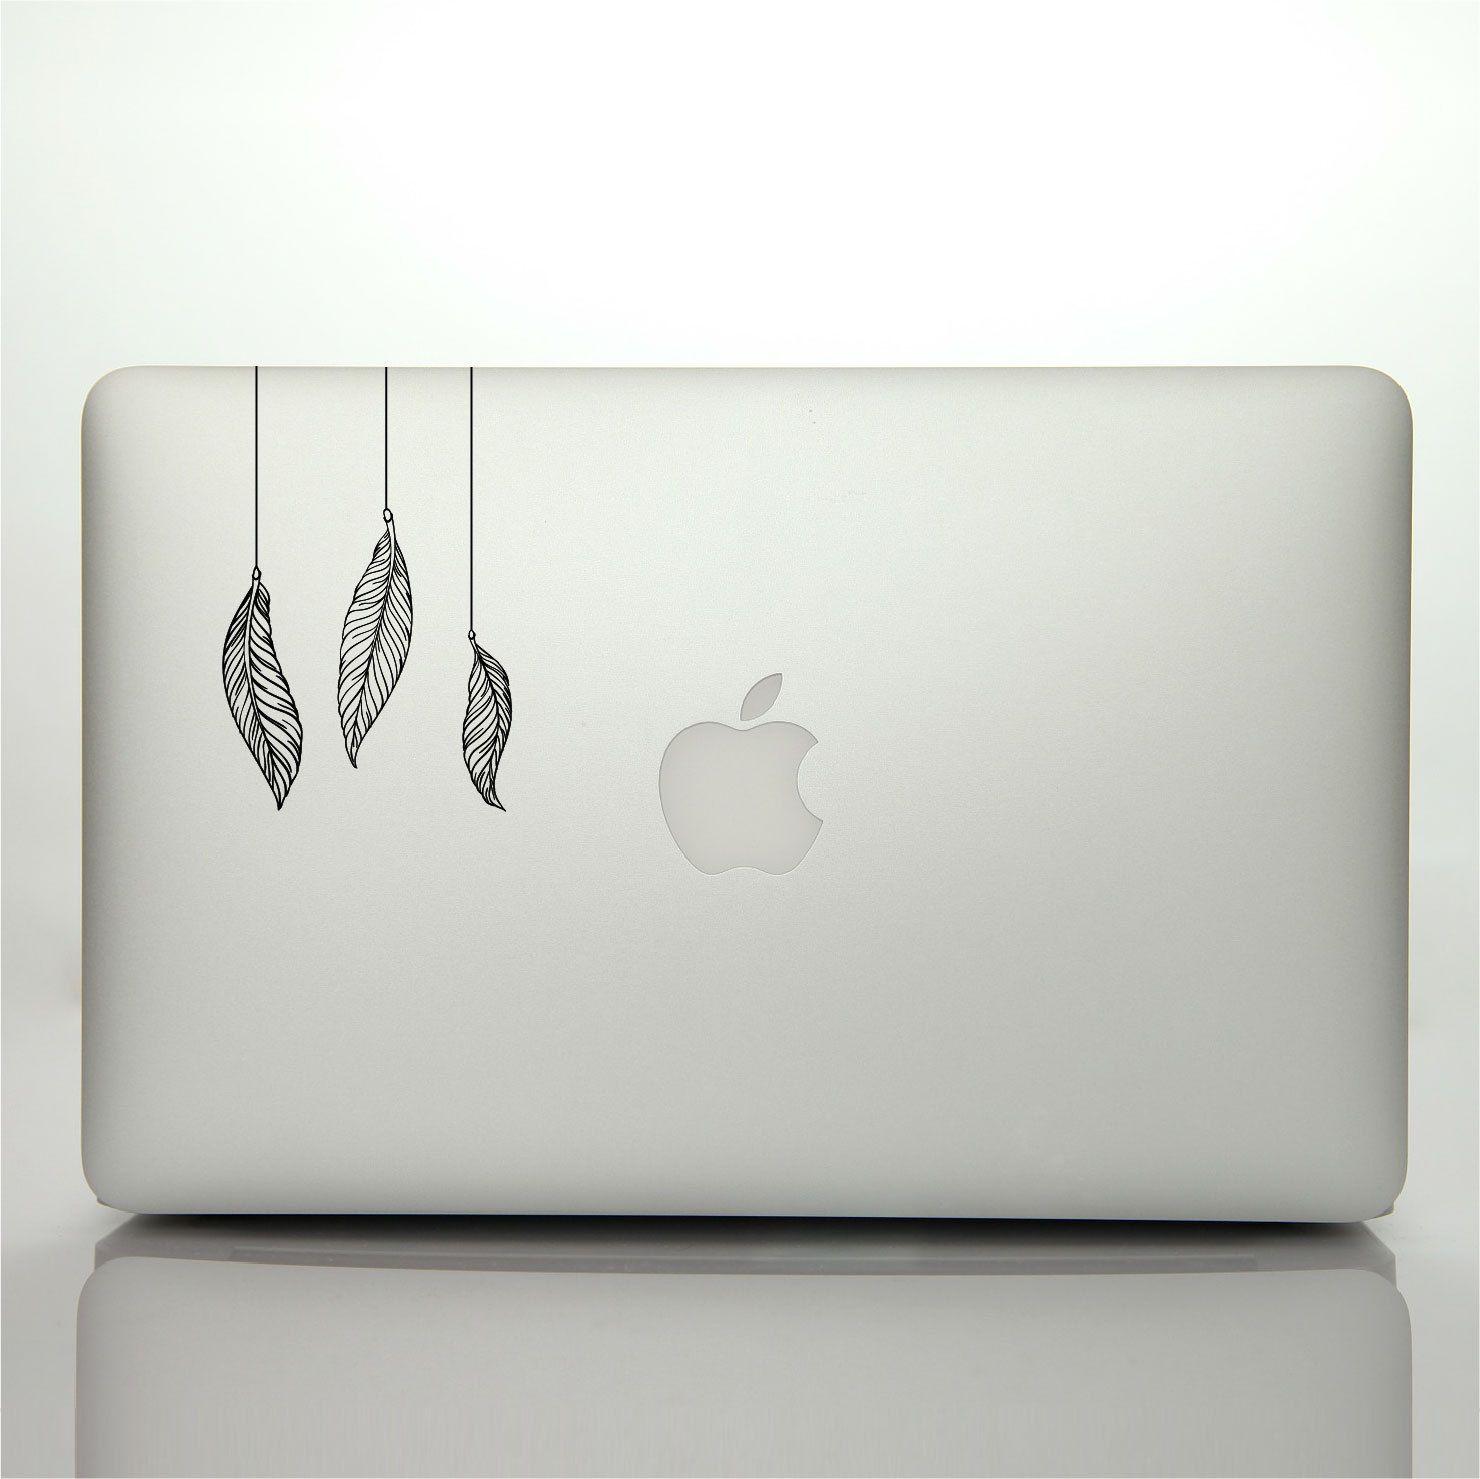 Laptop Sticker Feathers MacBook Decal Dream Catcher Bird Feather ...